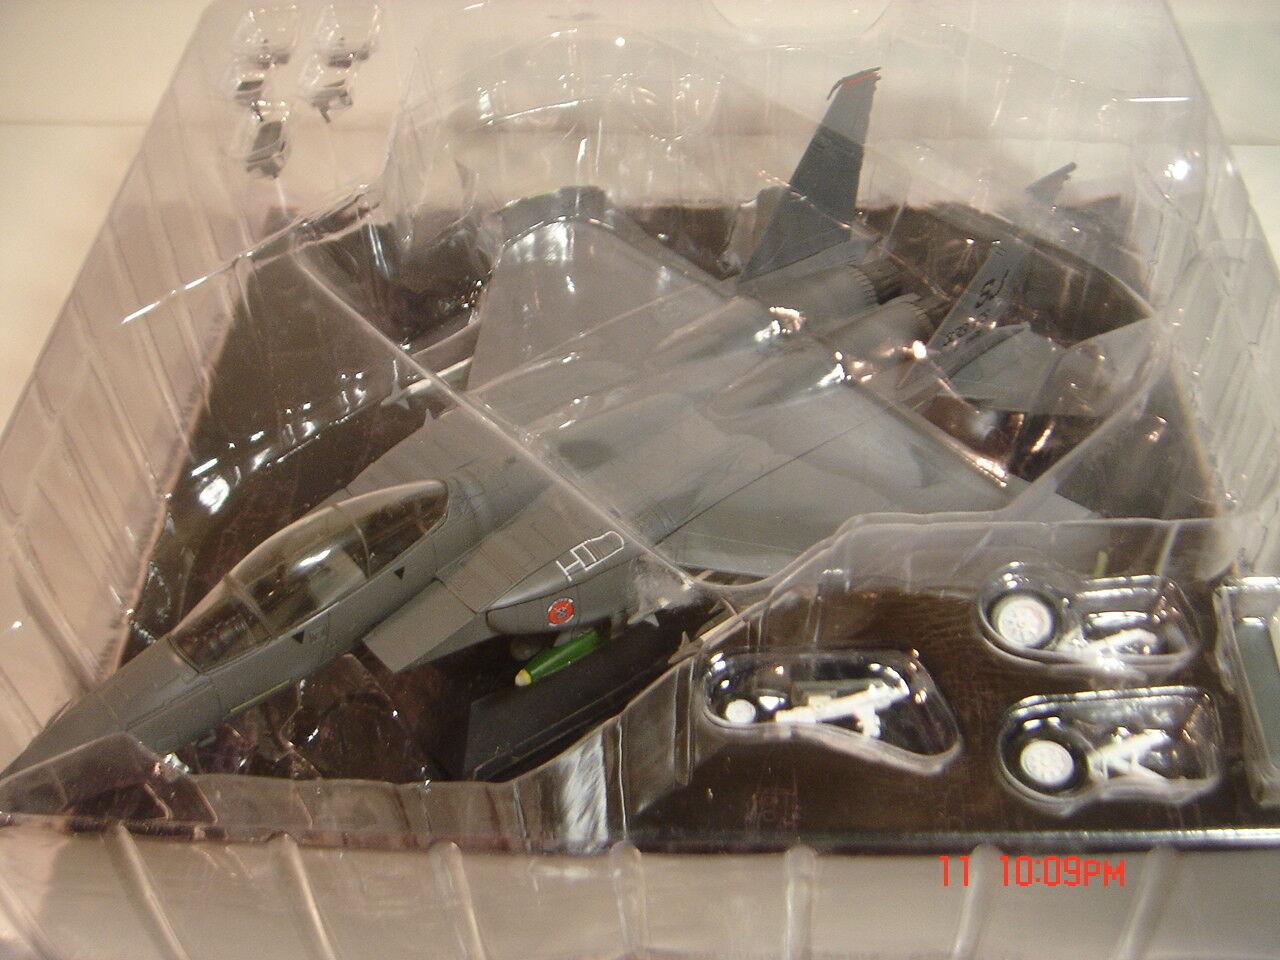 marcas en línea venta barata 1 72 ALTAYA ALTAYA ALTAYA F-15E STRIKE EAGLE USAAF  gran descuento